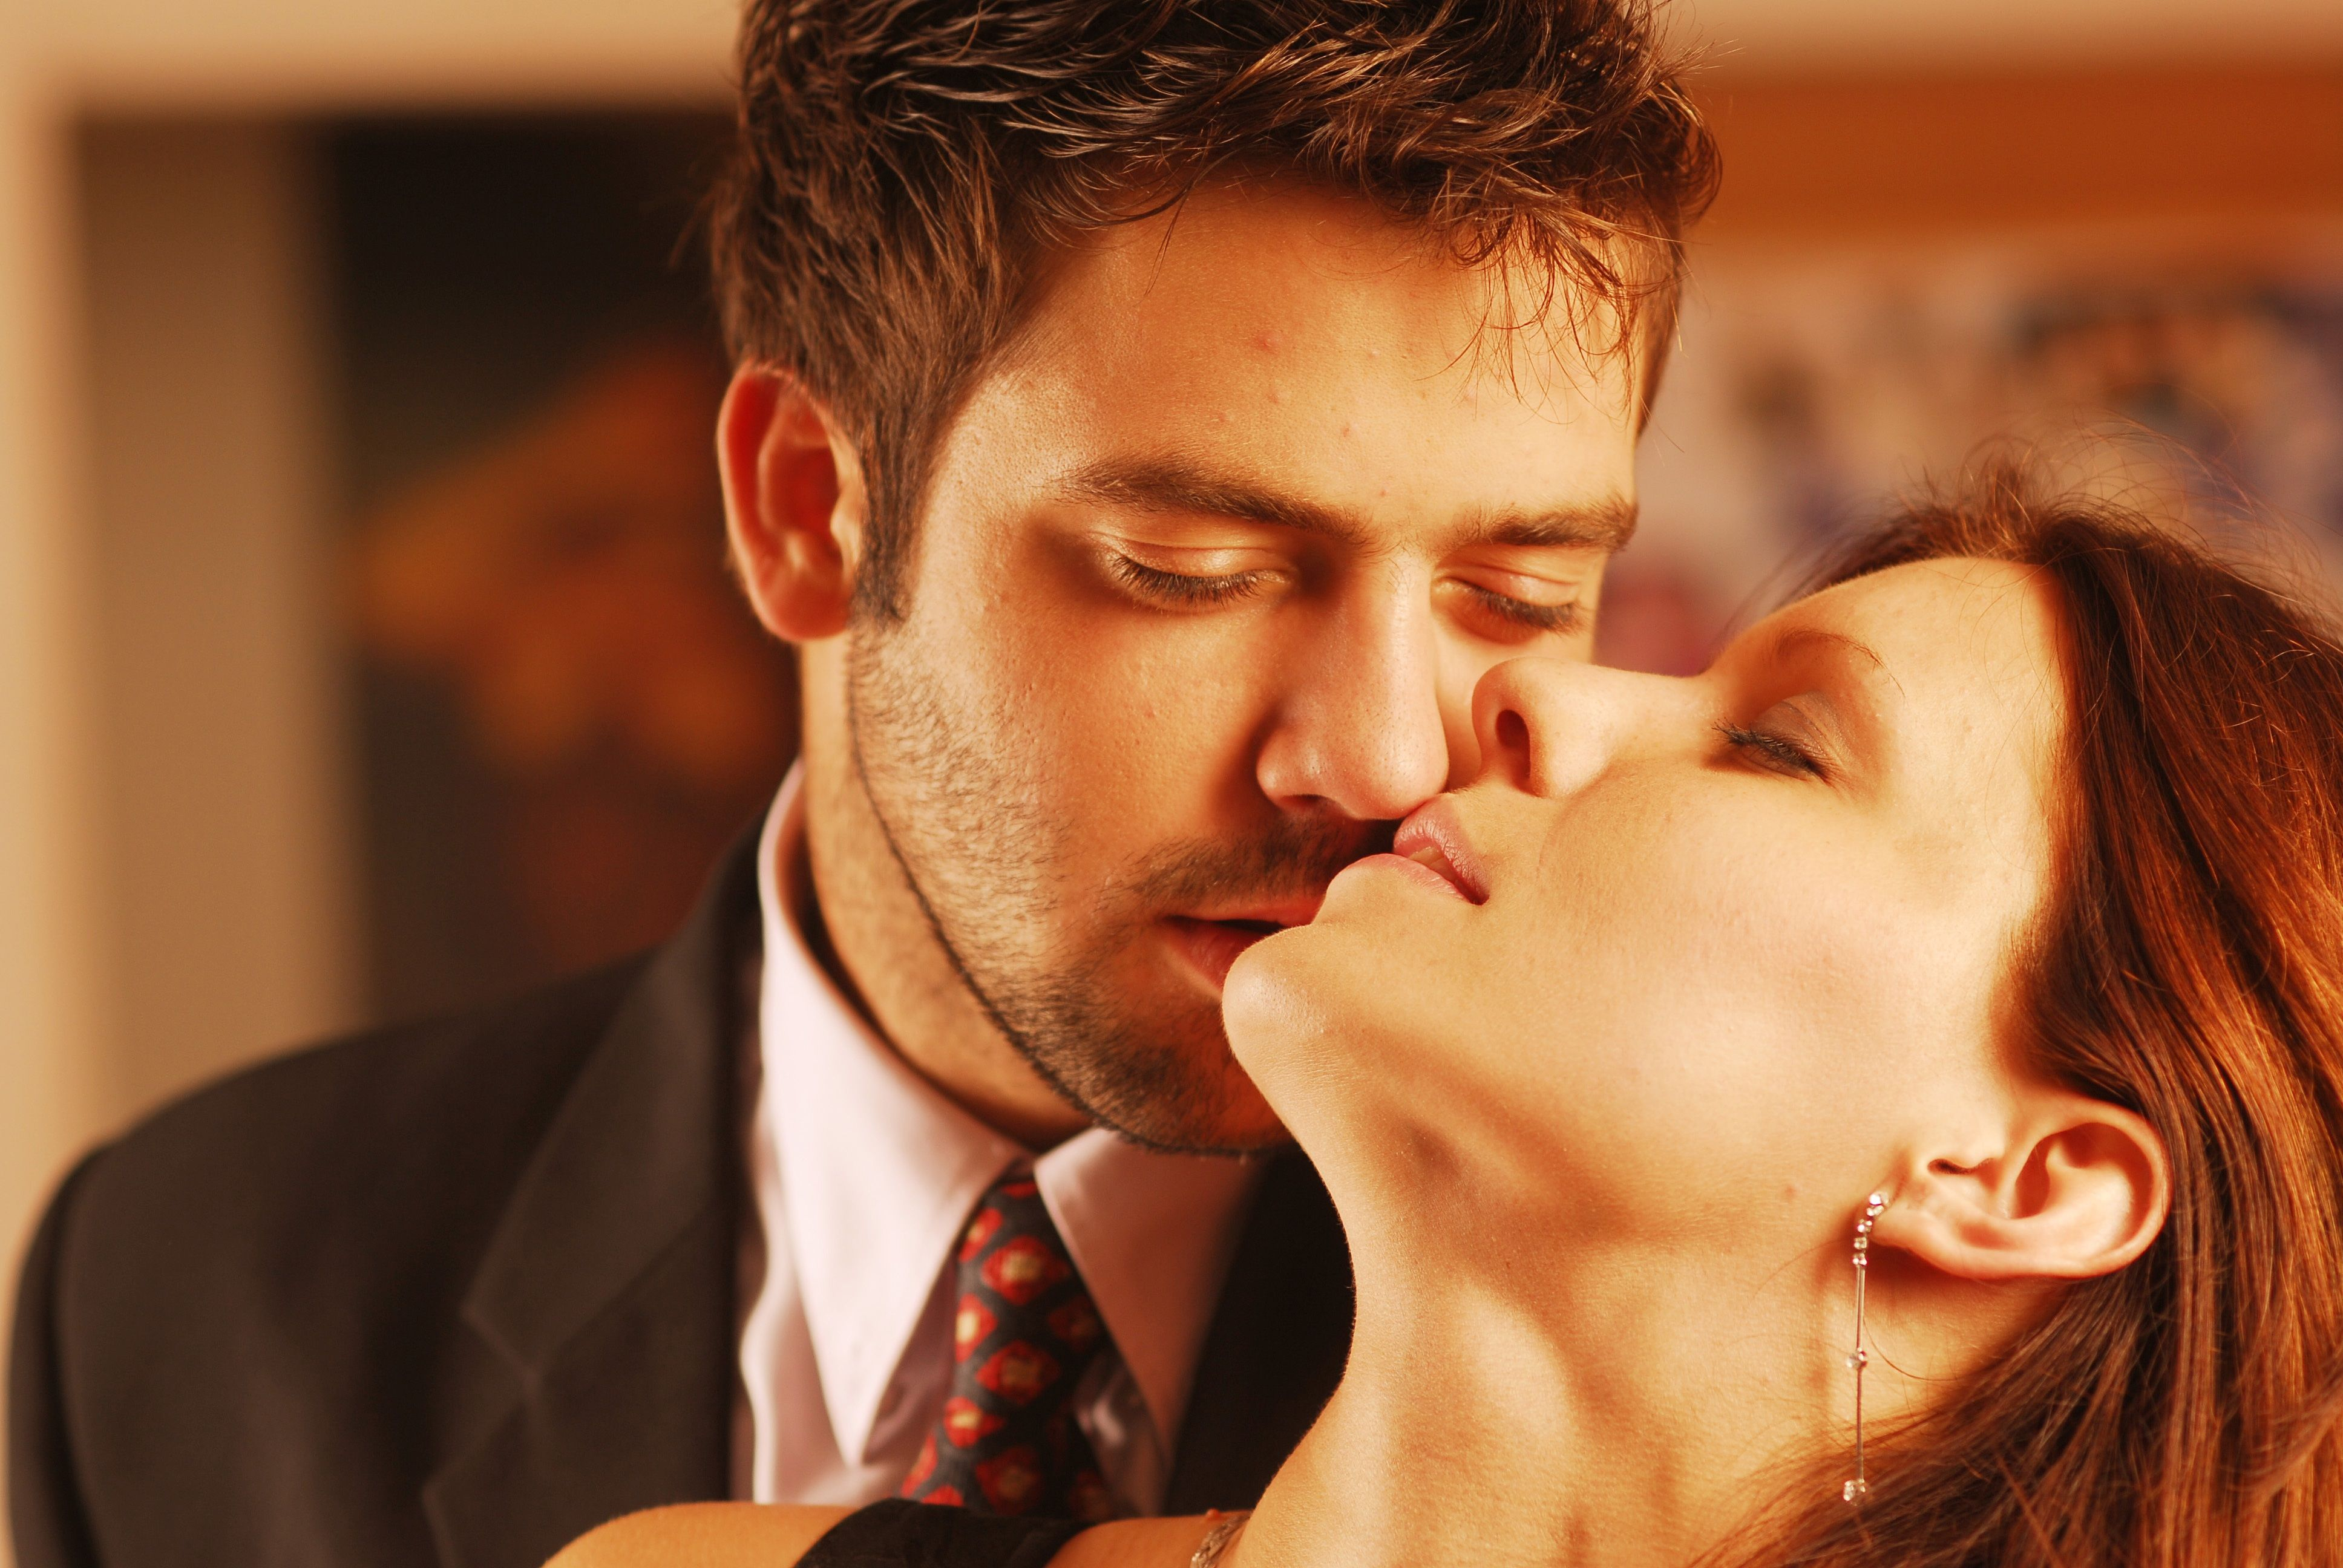 older dating dating agency login frau  Frau Rosenrot: Gedanken einer Lebenssüchtigen. Frau Rosenrot: Gedanken einer Lebenssüchtigen.